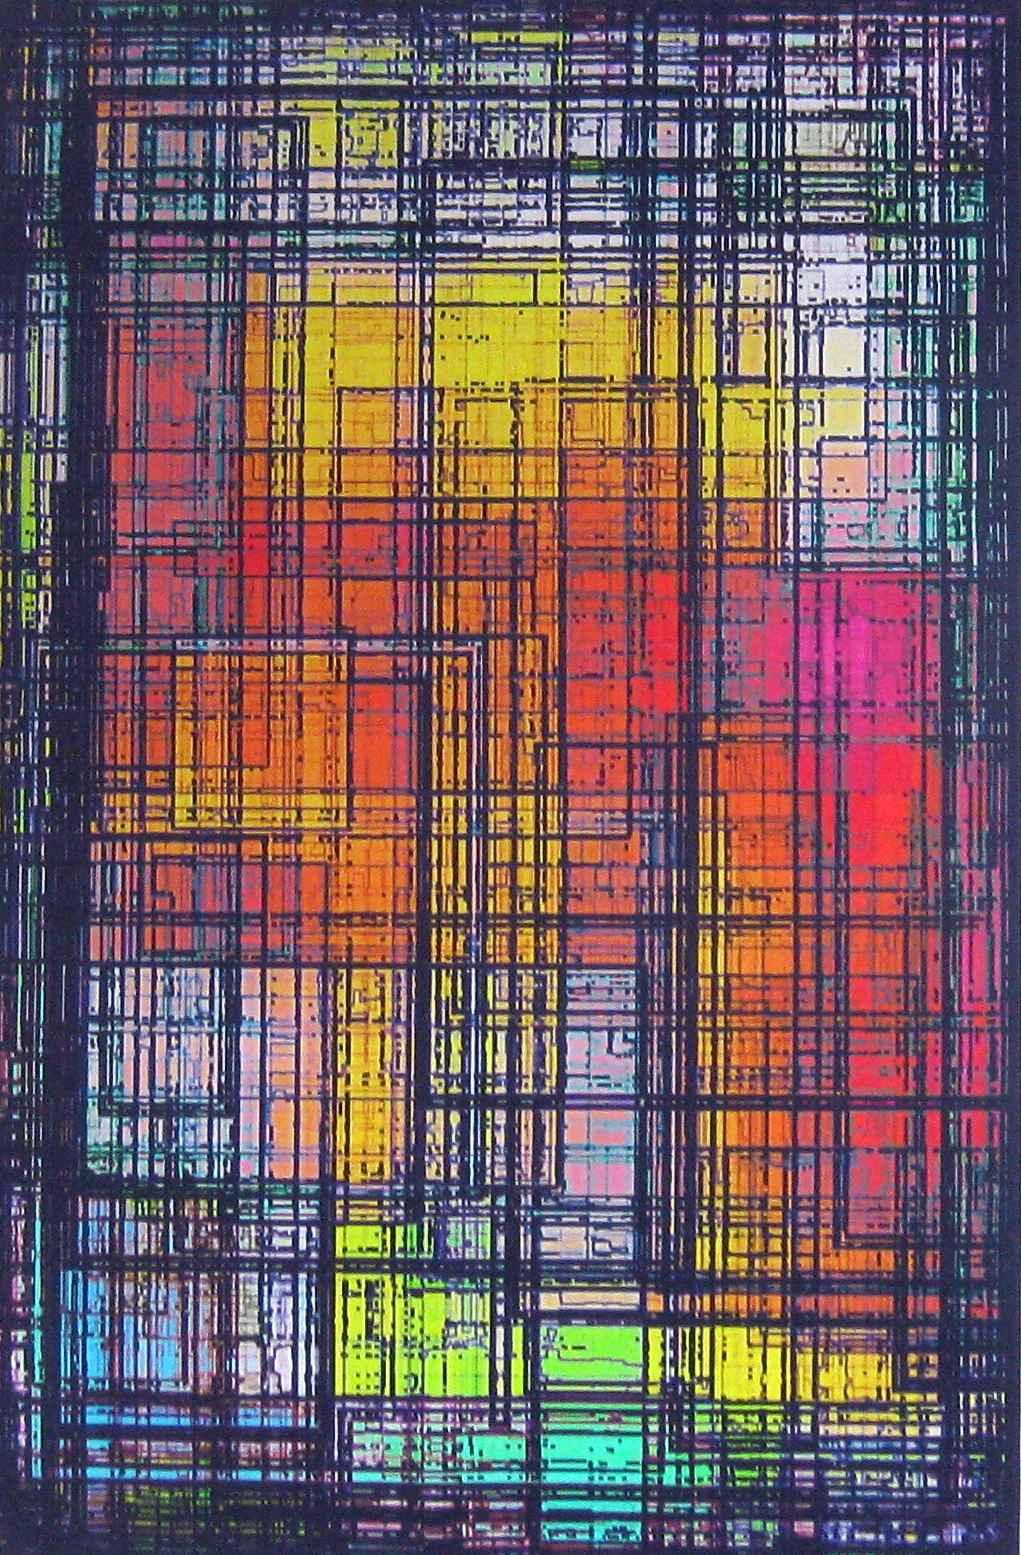 Data Structures Corru... by  Christopher Welch - Masterpiece Online